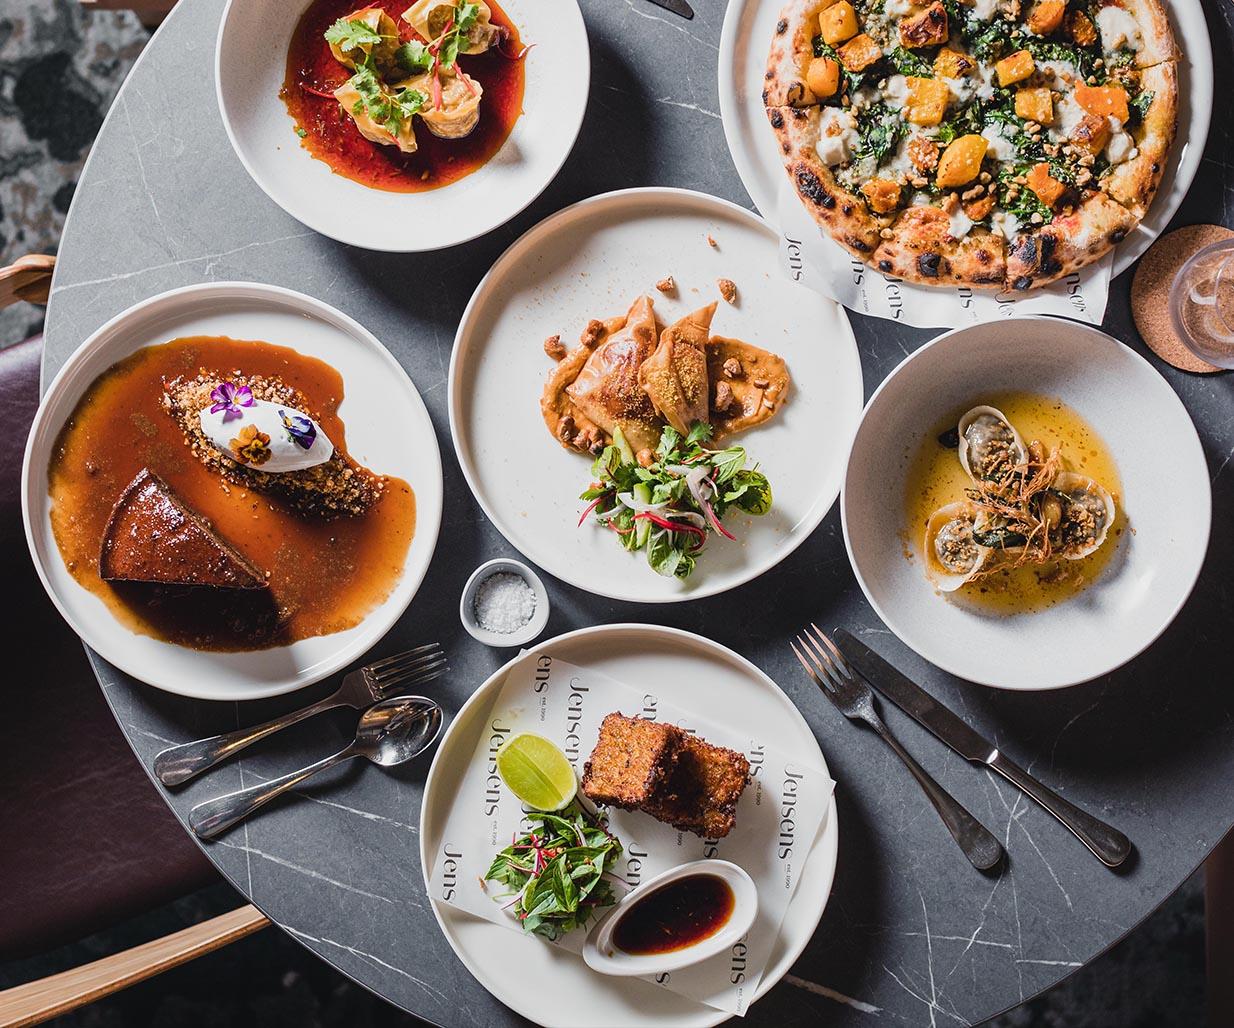 Brand & Website Design project in Sydney for hospitality venue Jensens Restaurant, a leader in the food service industry of Australia, image K